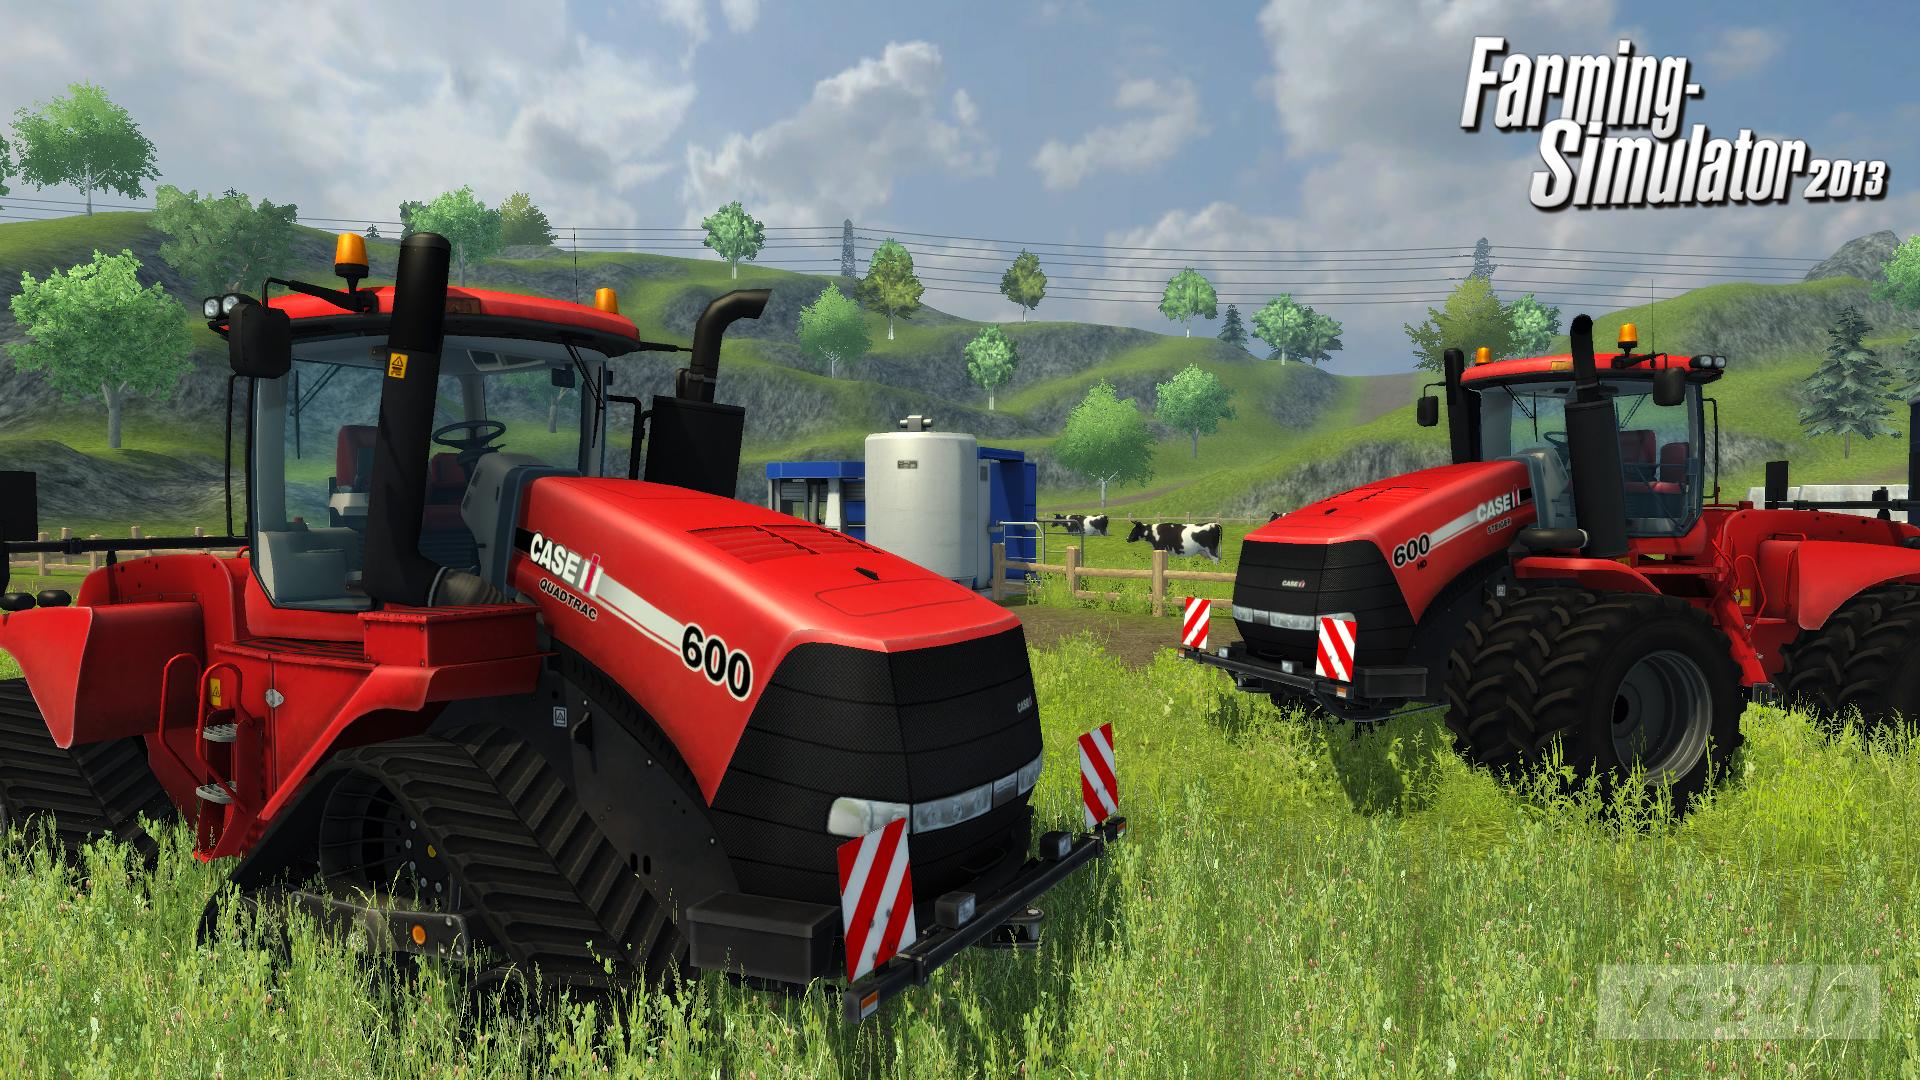 http://assets.vg247.com/current//2012/07/farming_sim2013-scr01.jpg